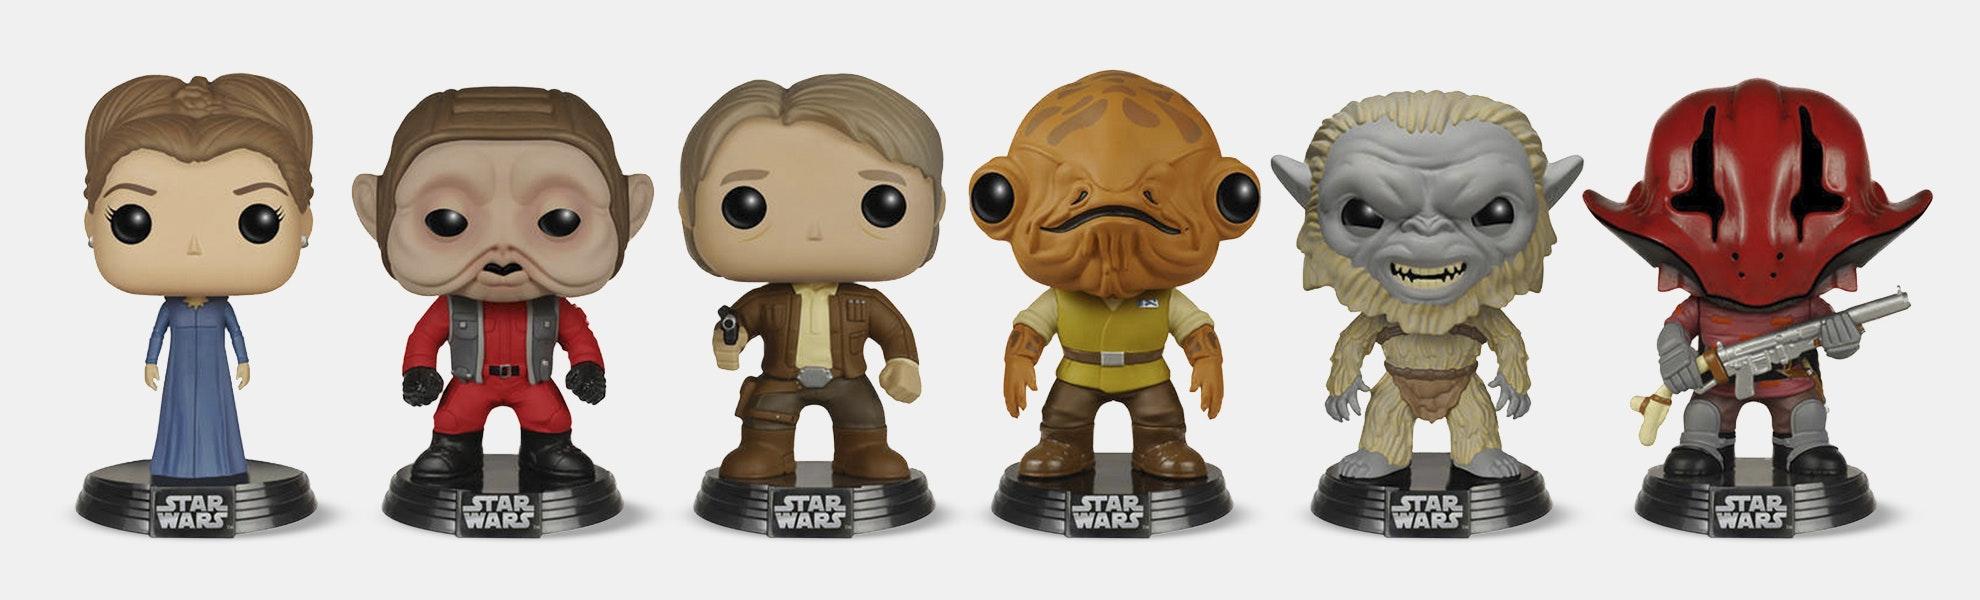 Funko POP! Star Wars Episode VII Set (6-pack)